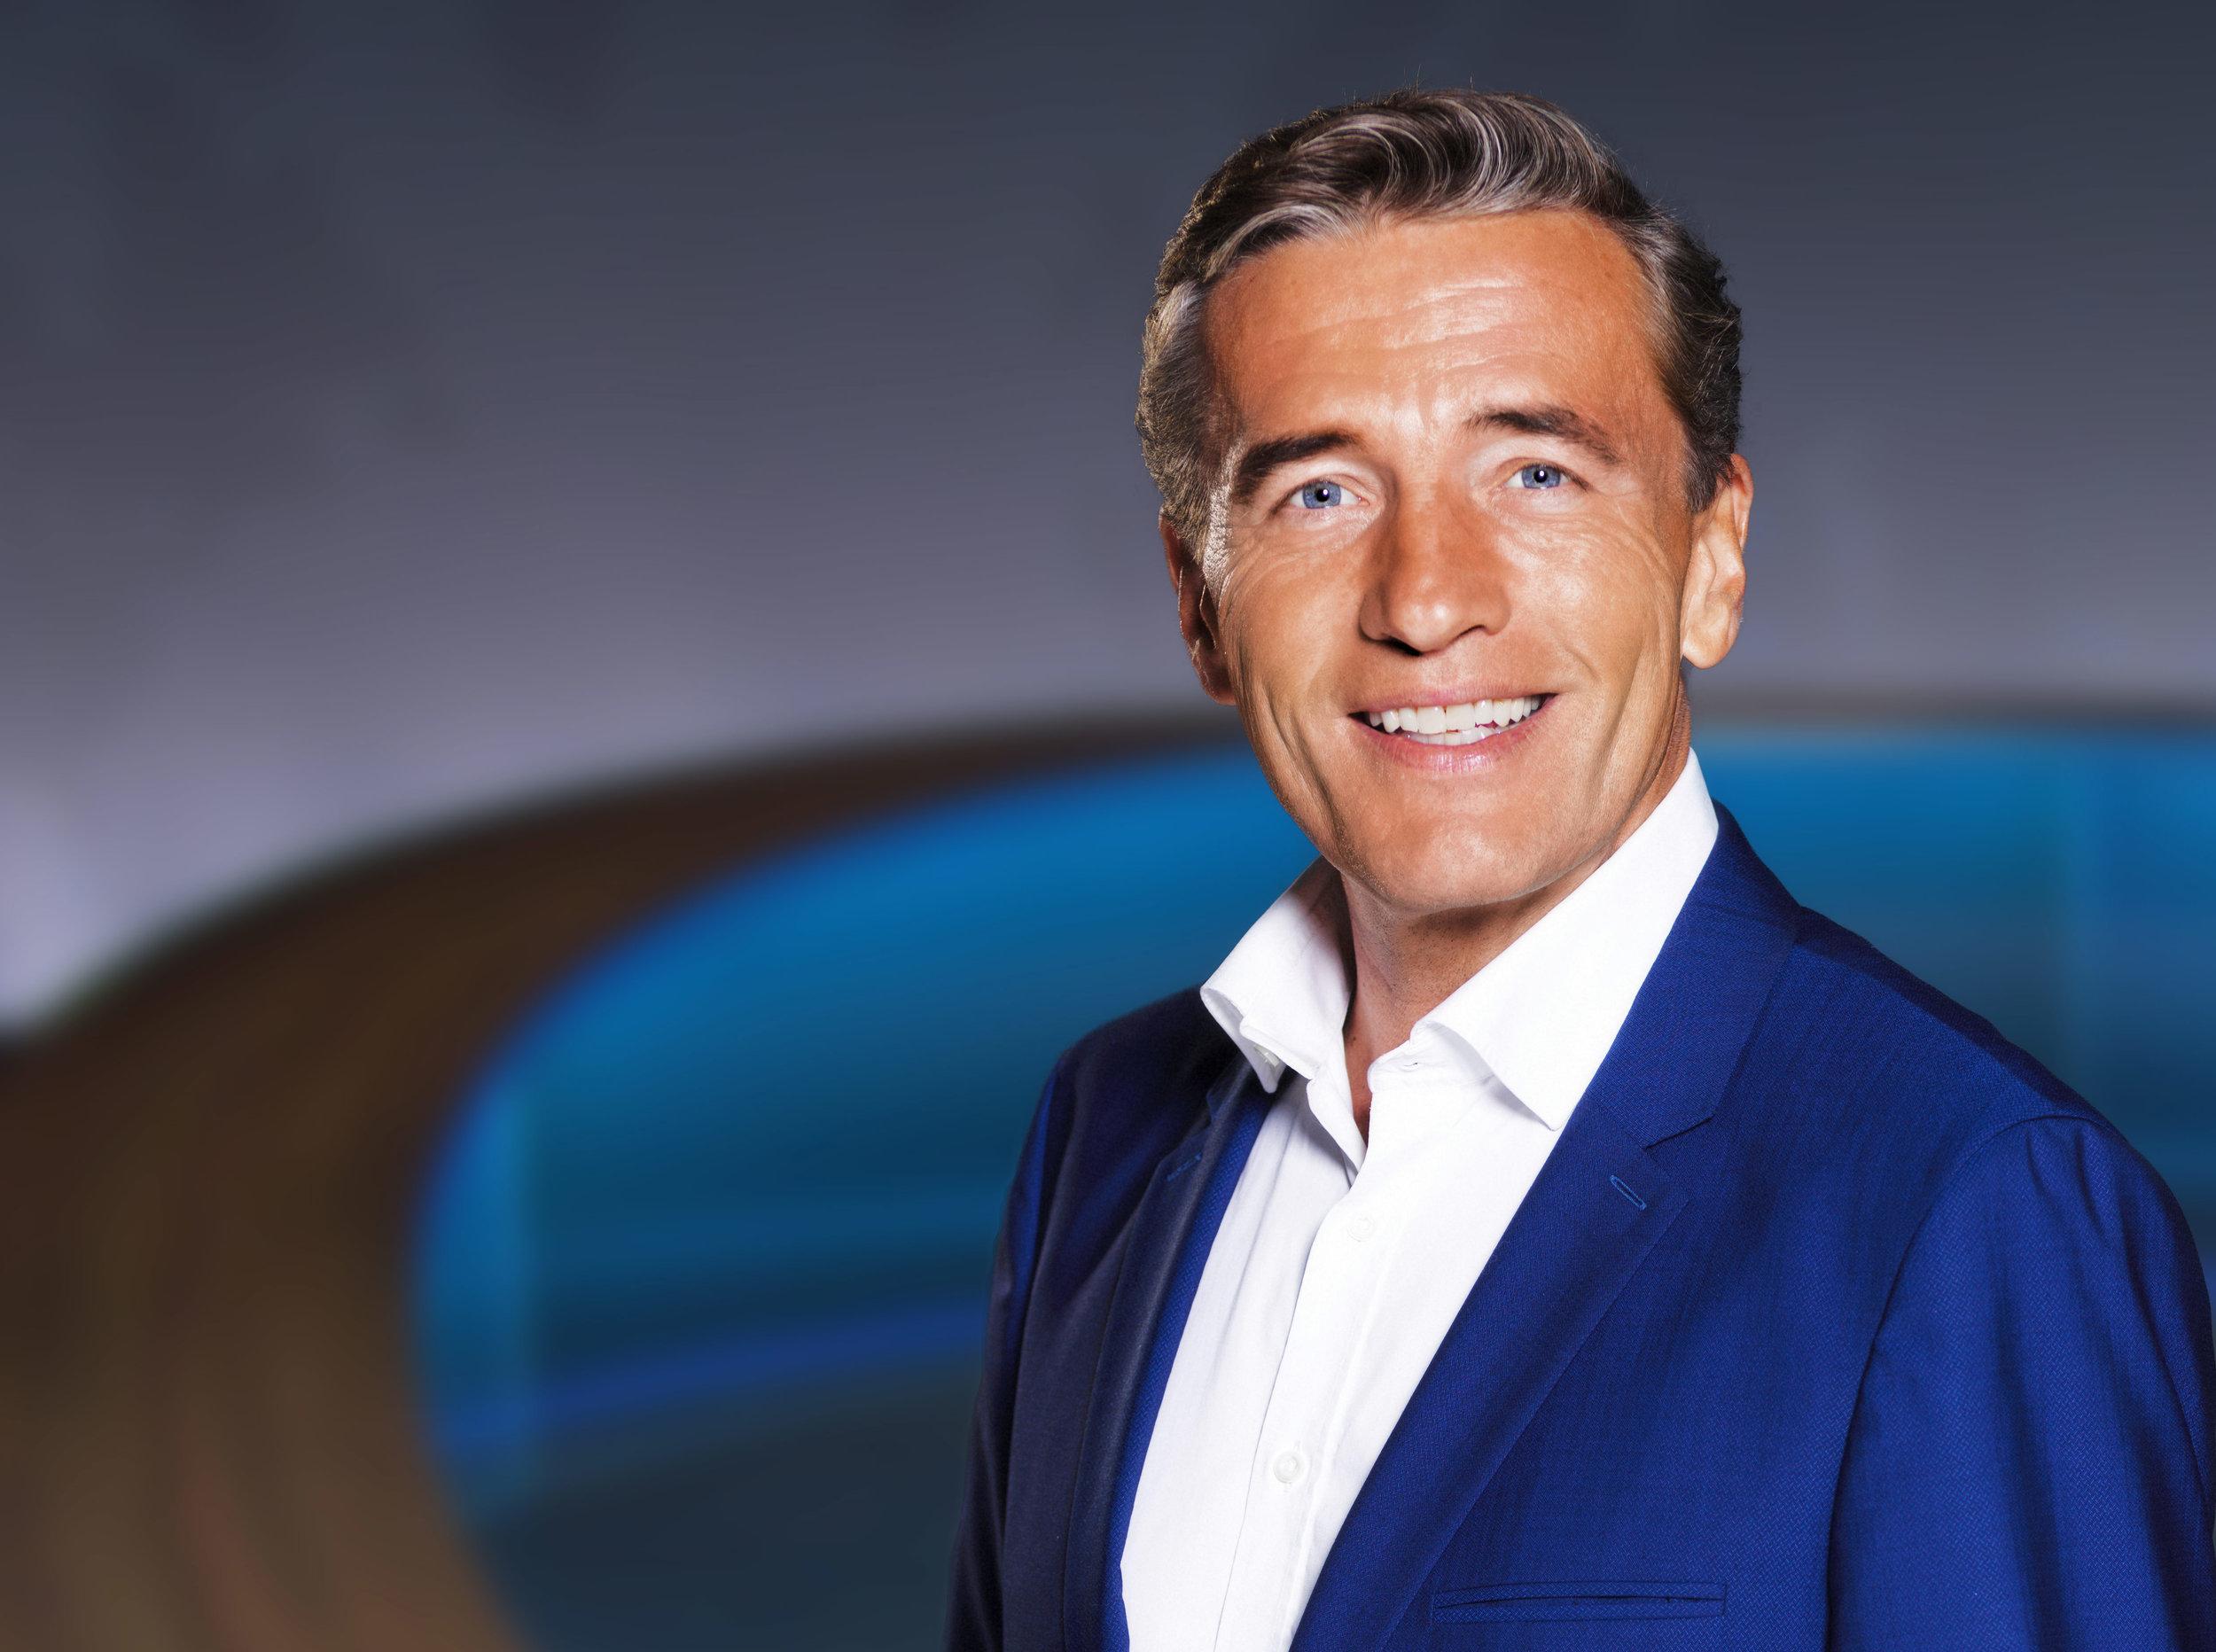 Moderator Stefan Scheider